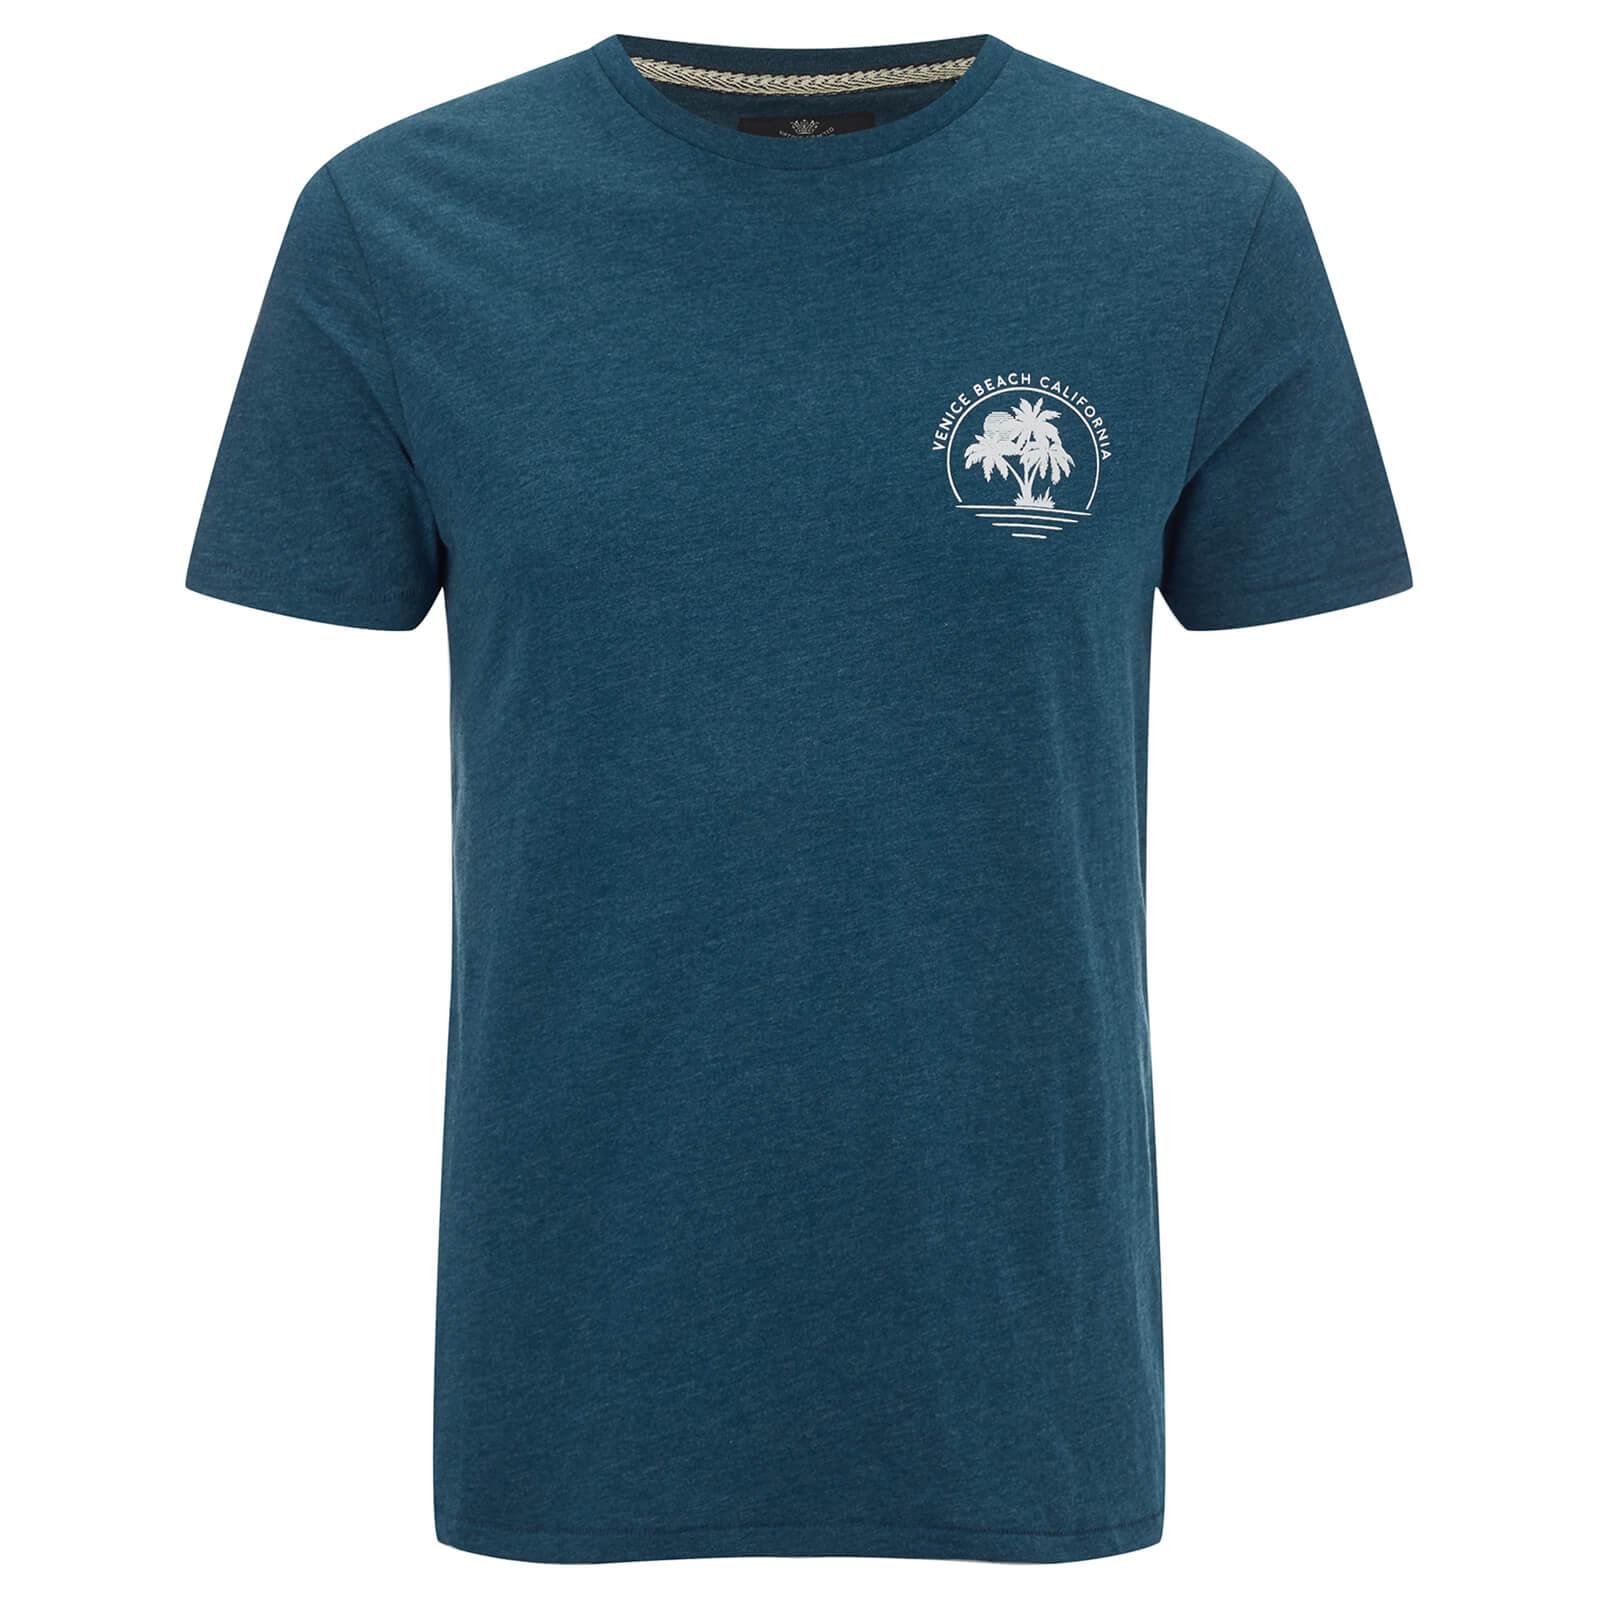 Threadbare Men's Venice Beach T-Shirt - Ocean Blue Marl Talla. s